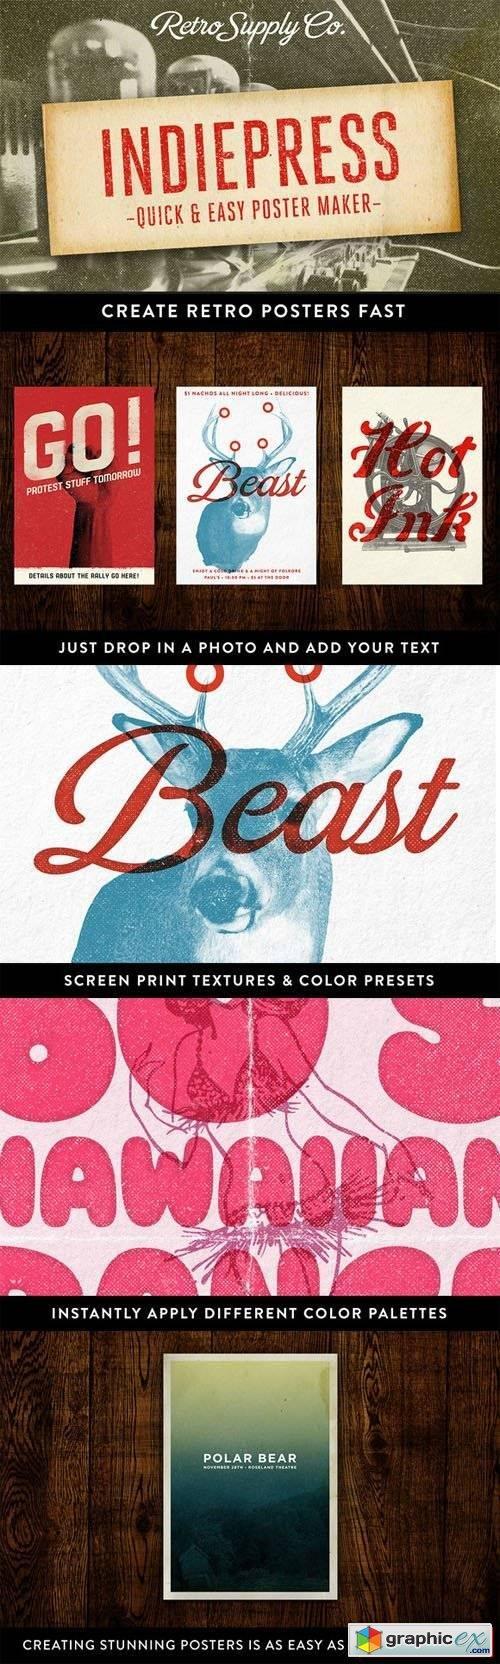 Poster design maker free download - Indiepress Quick Poster Maker